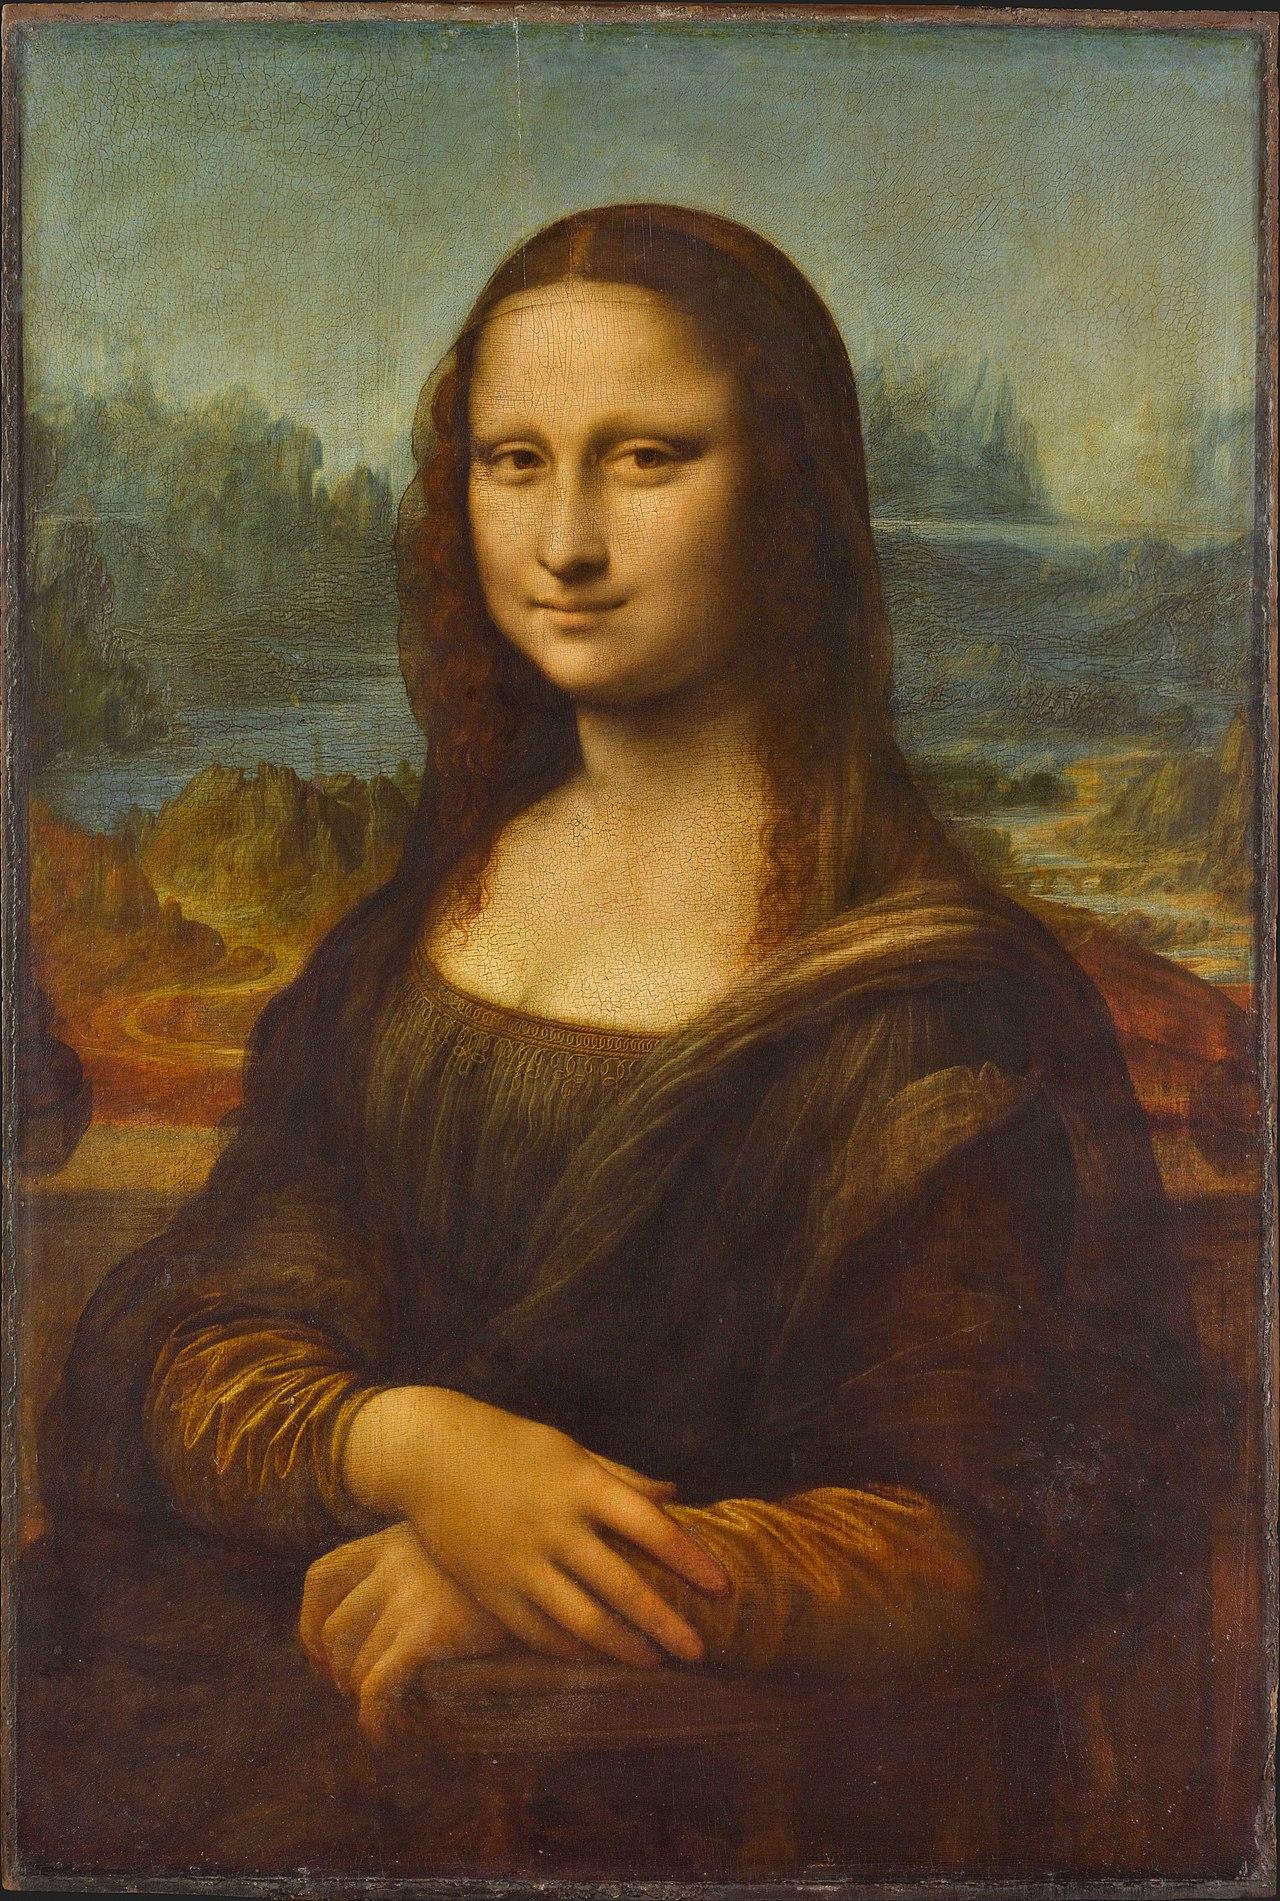 1280px-Leonardo_da_Vinci_-_Mona_Lisa_%28